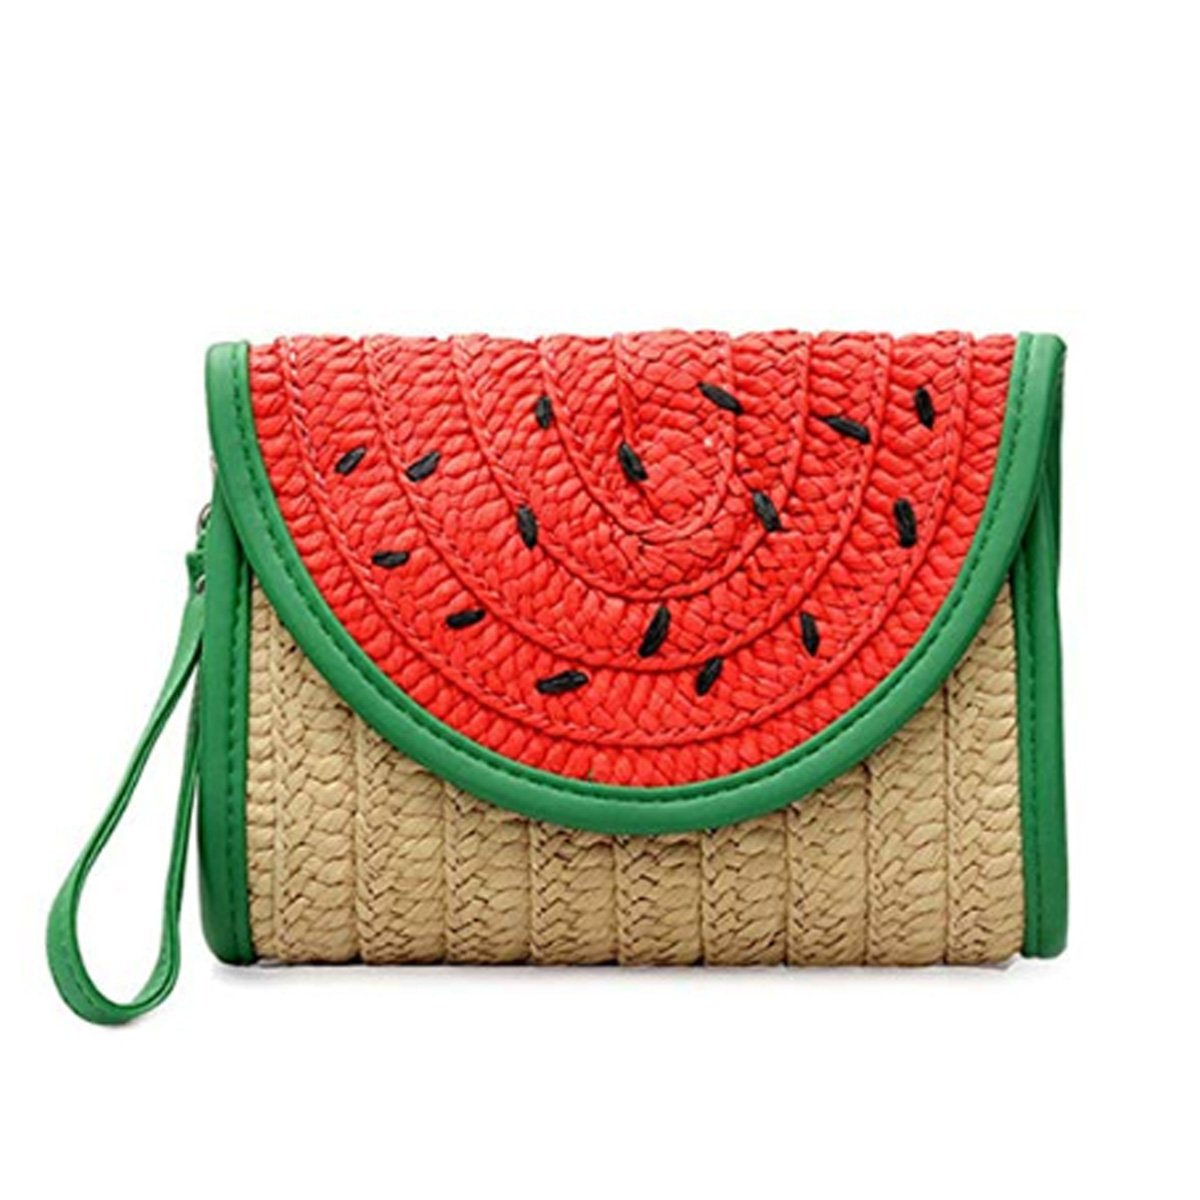 Women Cute Watermelon Purse Summer Straw Clutch Purse Fruit Shape Beach Bag With Wristlet